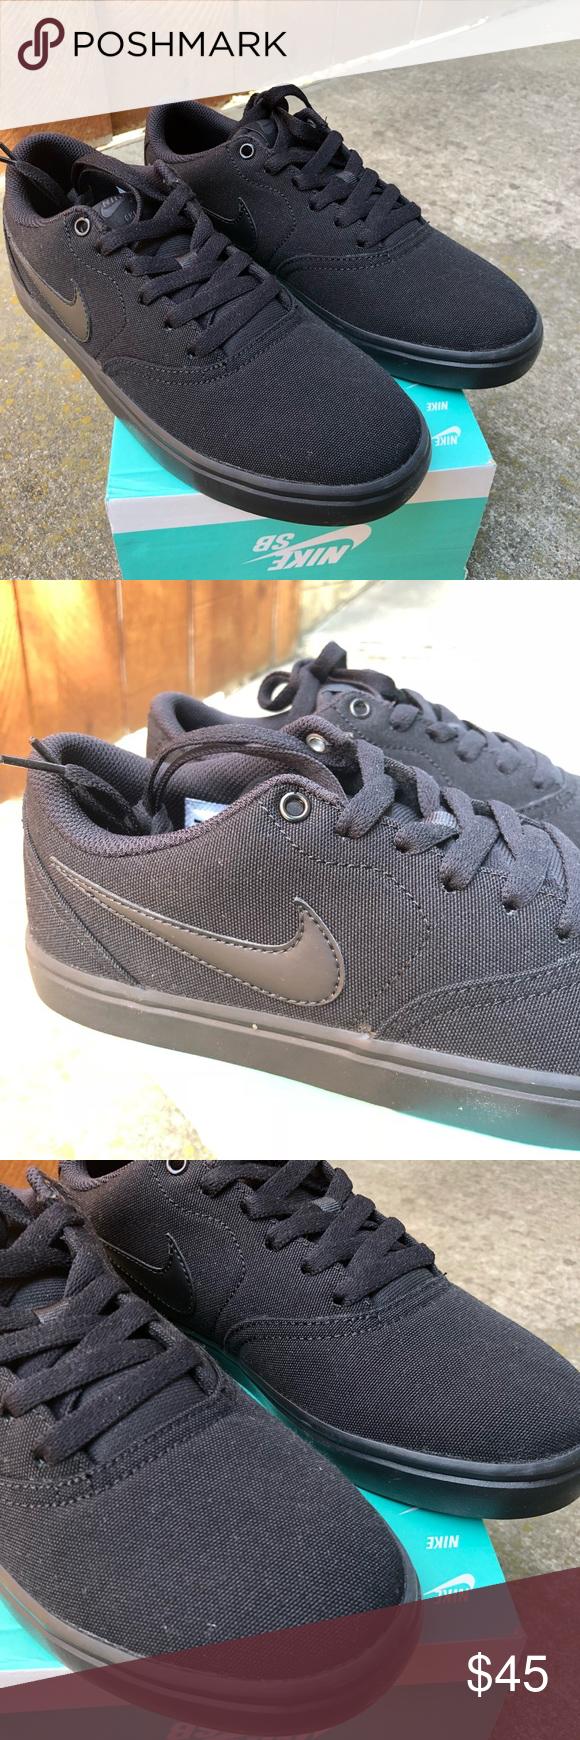 Nike Sb Check Solar Cnvs Wmns All Black Fashion Women Shoes Black Nikes